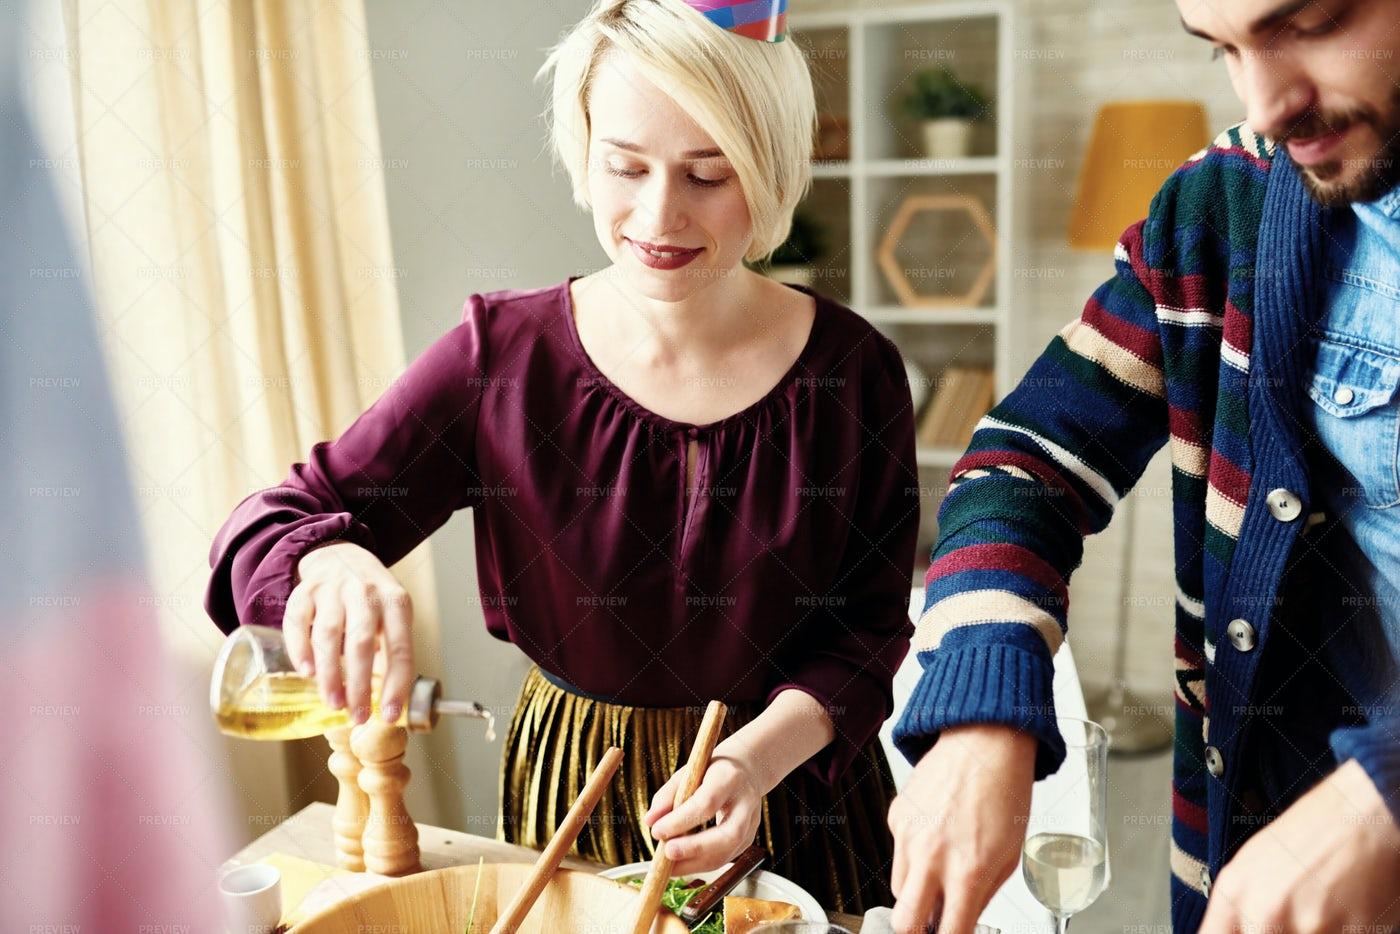 Young Woman Making Salad At Party: Stock Photos